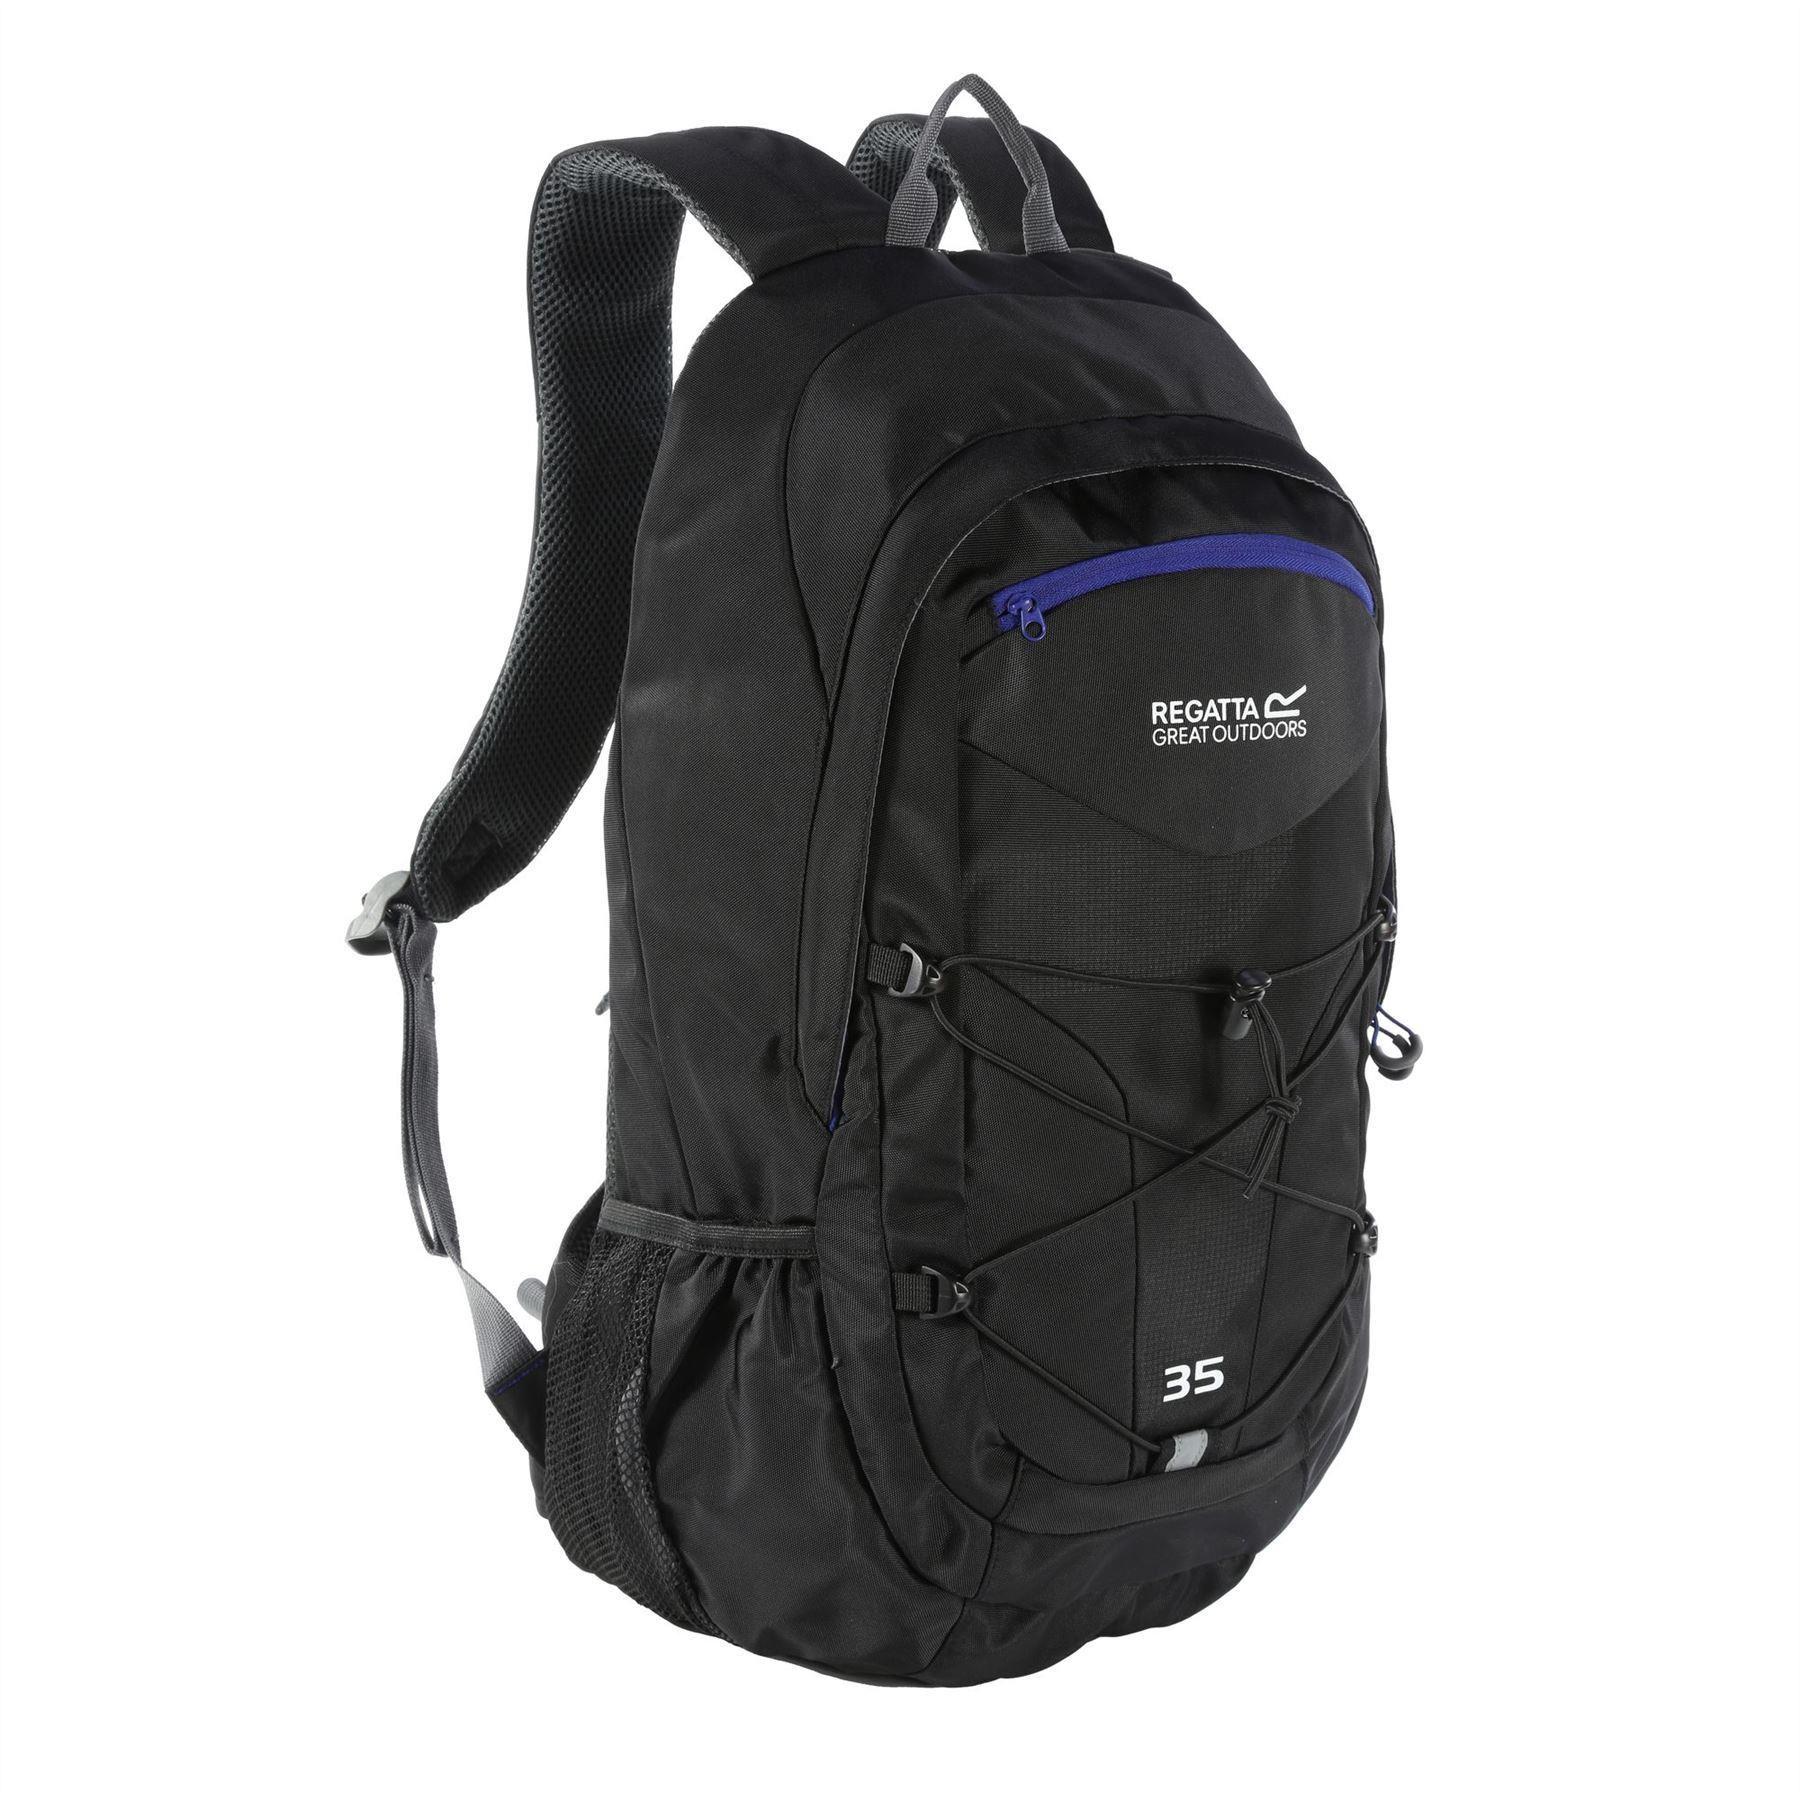 miniatuur 5 - Regatta Atholl II 35 Litre Walking Backpack Rucksack Mens Womens Hiking Travel